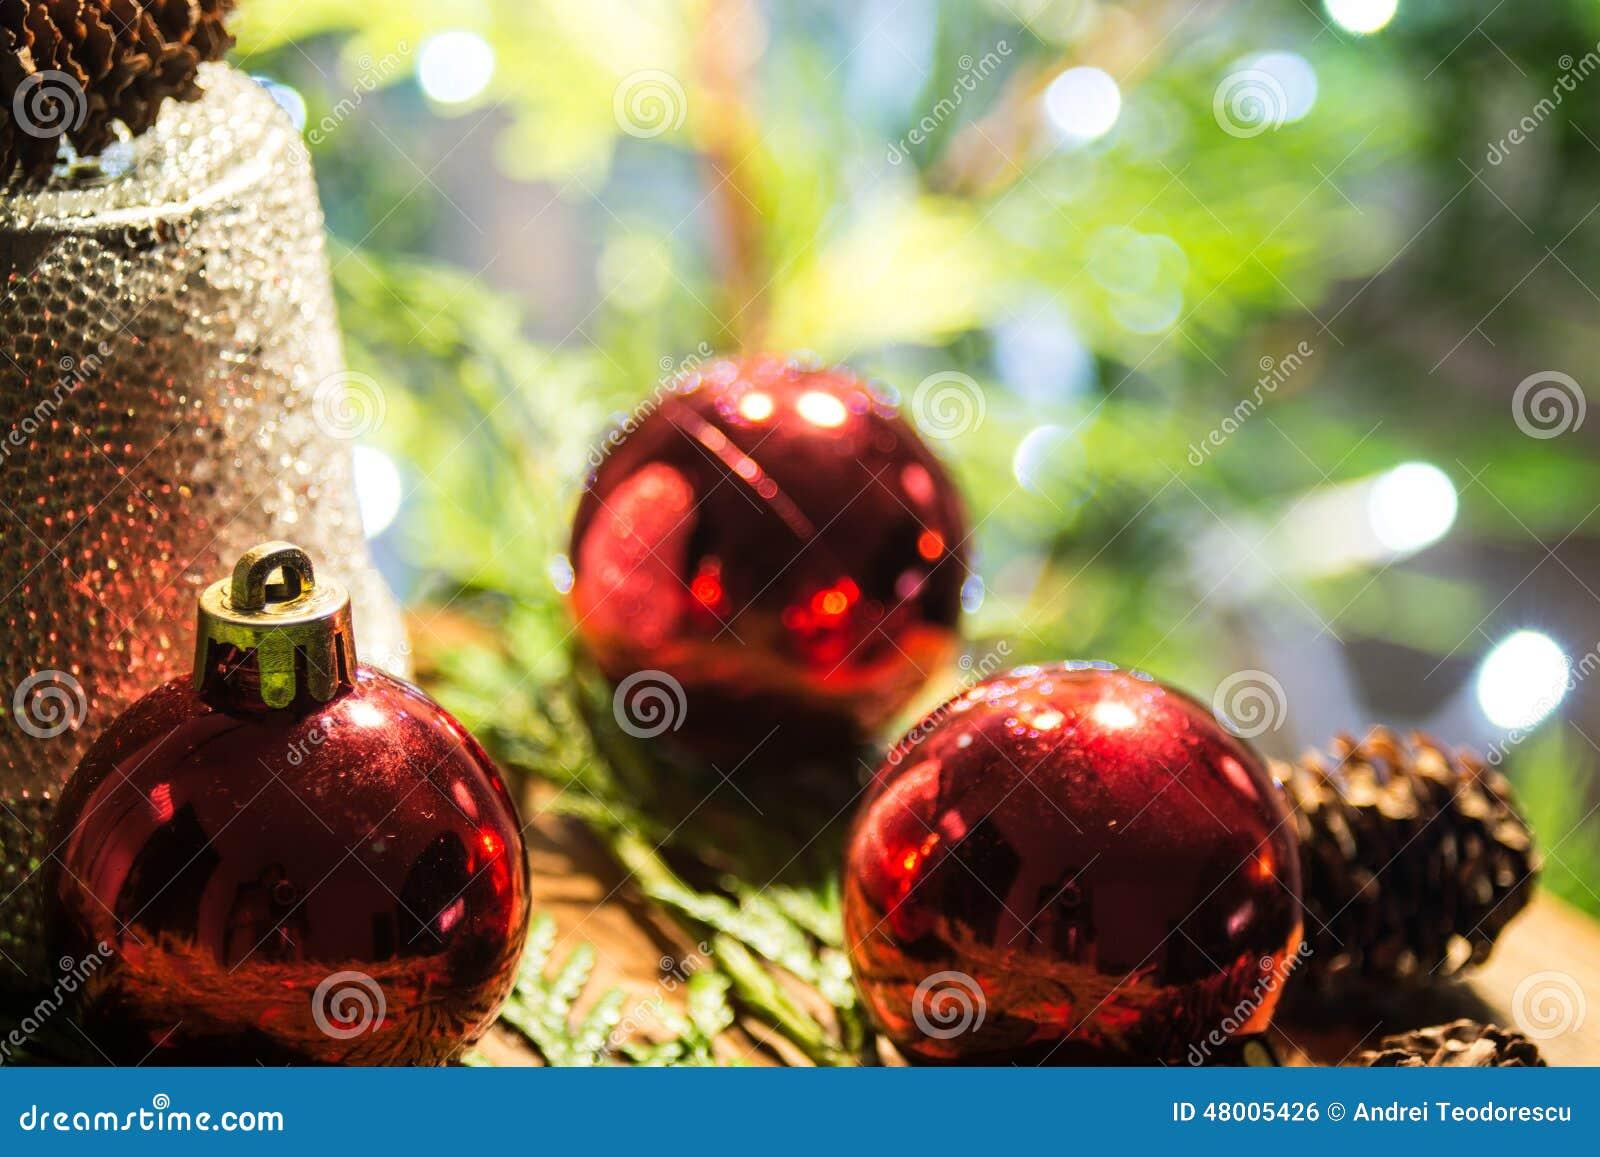 Christmas theme stock photo. Image of happy, plasticine - 48005426